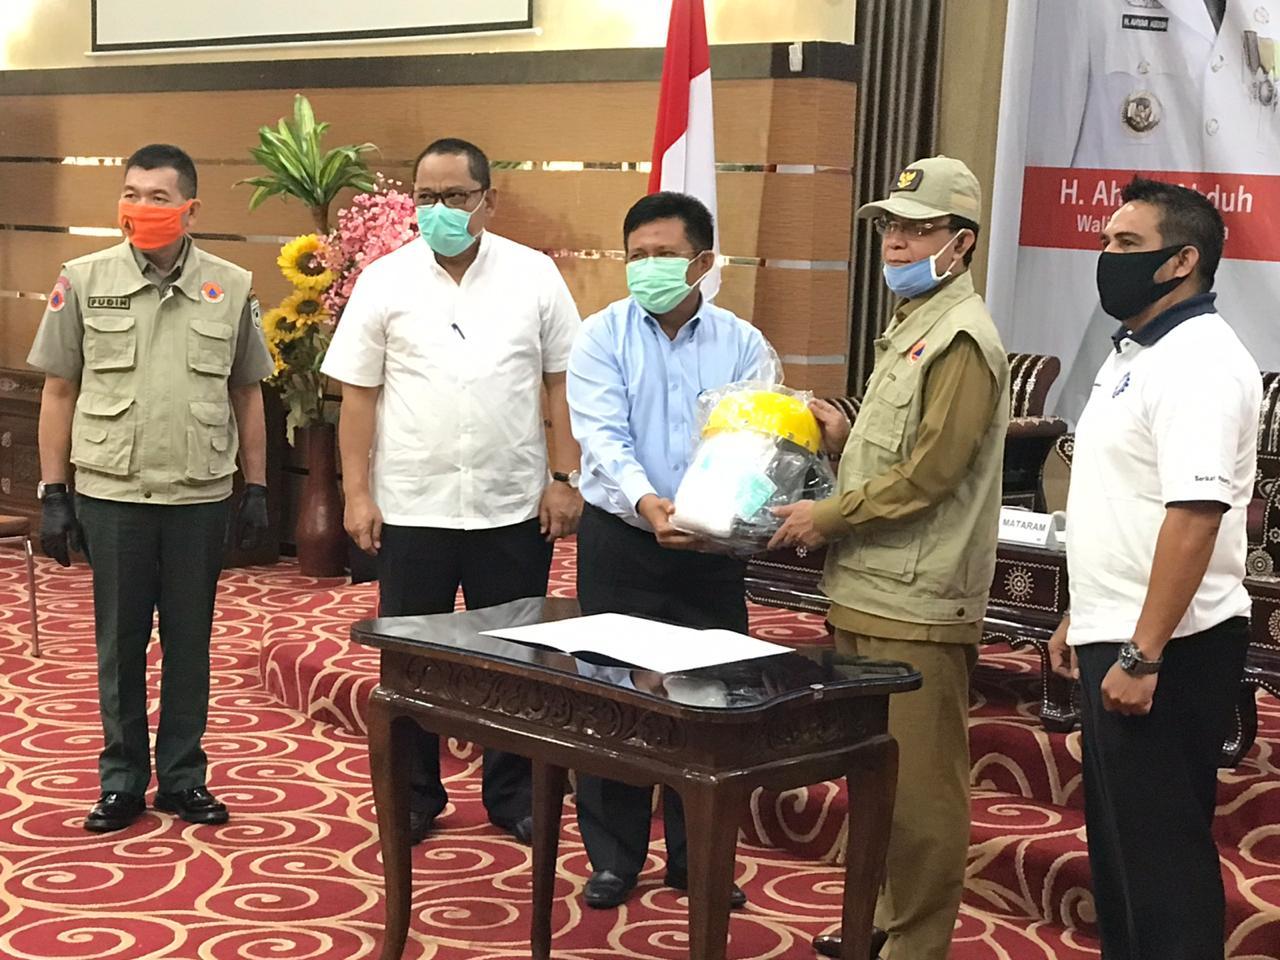 PEDULI: Direktur Utama PT Air Minum Giri Menang L. Ahmad Zaini (tiga dari kiri) memberikan bantuan APD secara simbolis kepada Wali Kota Mataram H. Ahyar Abduh di Aula Pendopo, kemarin.